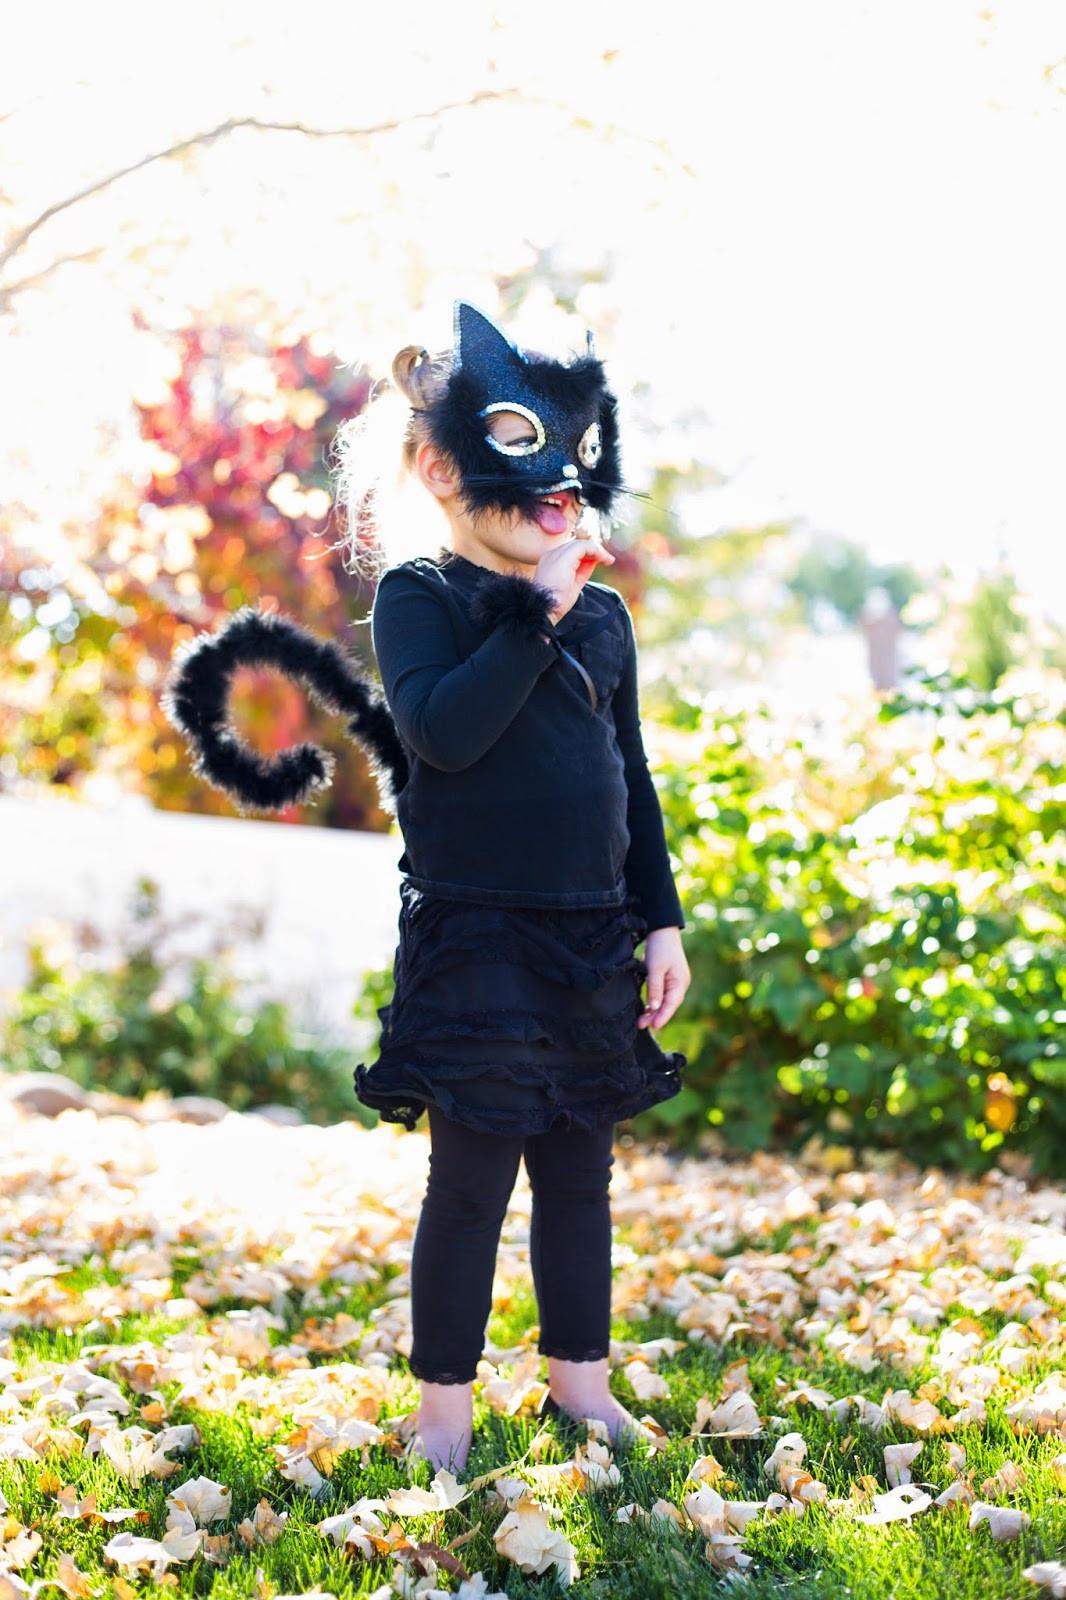 Diy Kids Cat Costume  do it yourself divas Little Girl Cat Costume for Halloween